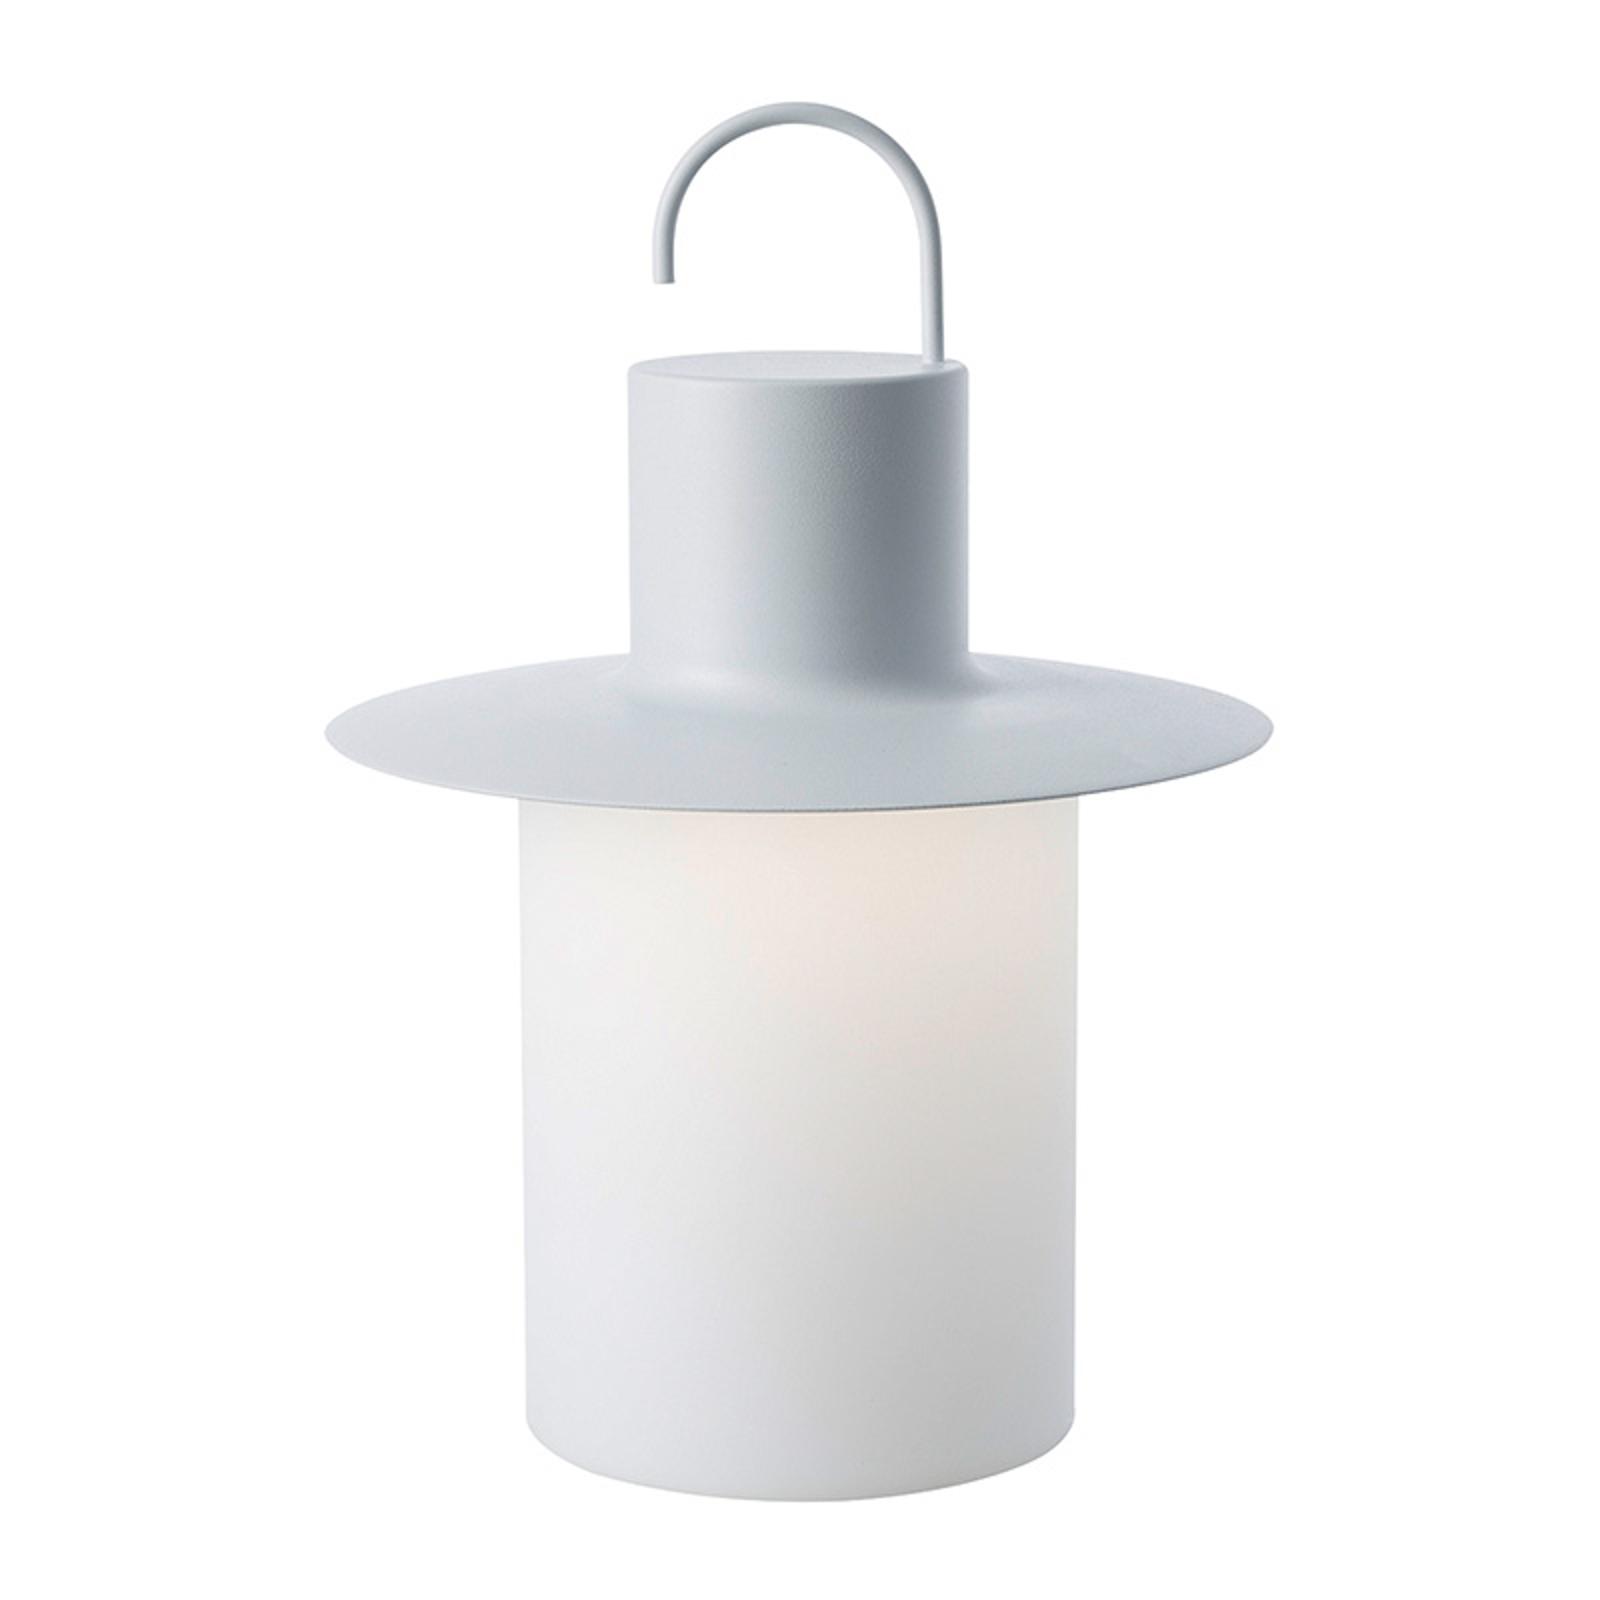 Nautic LED-terrasselampe, 6 x USB, hvid